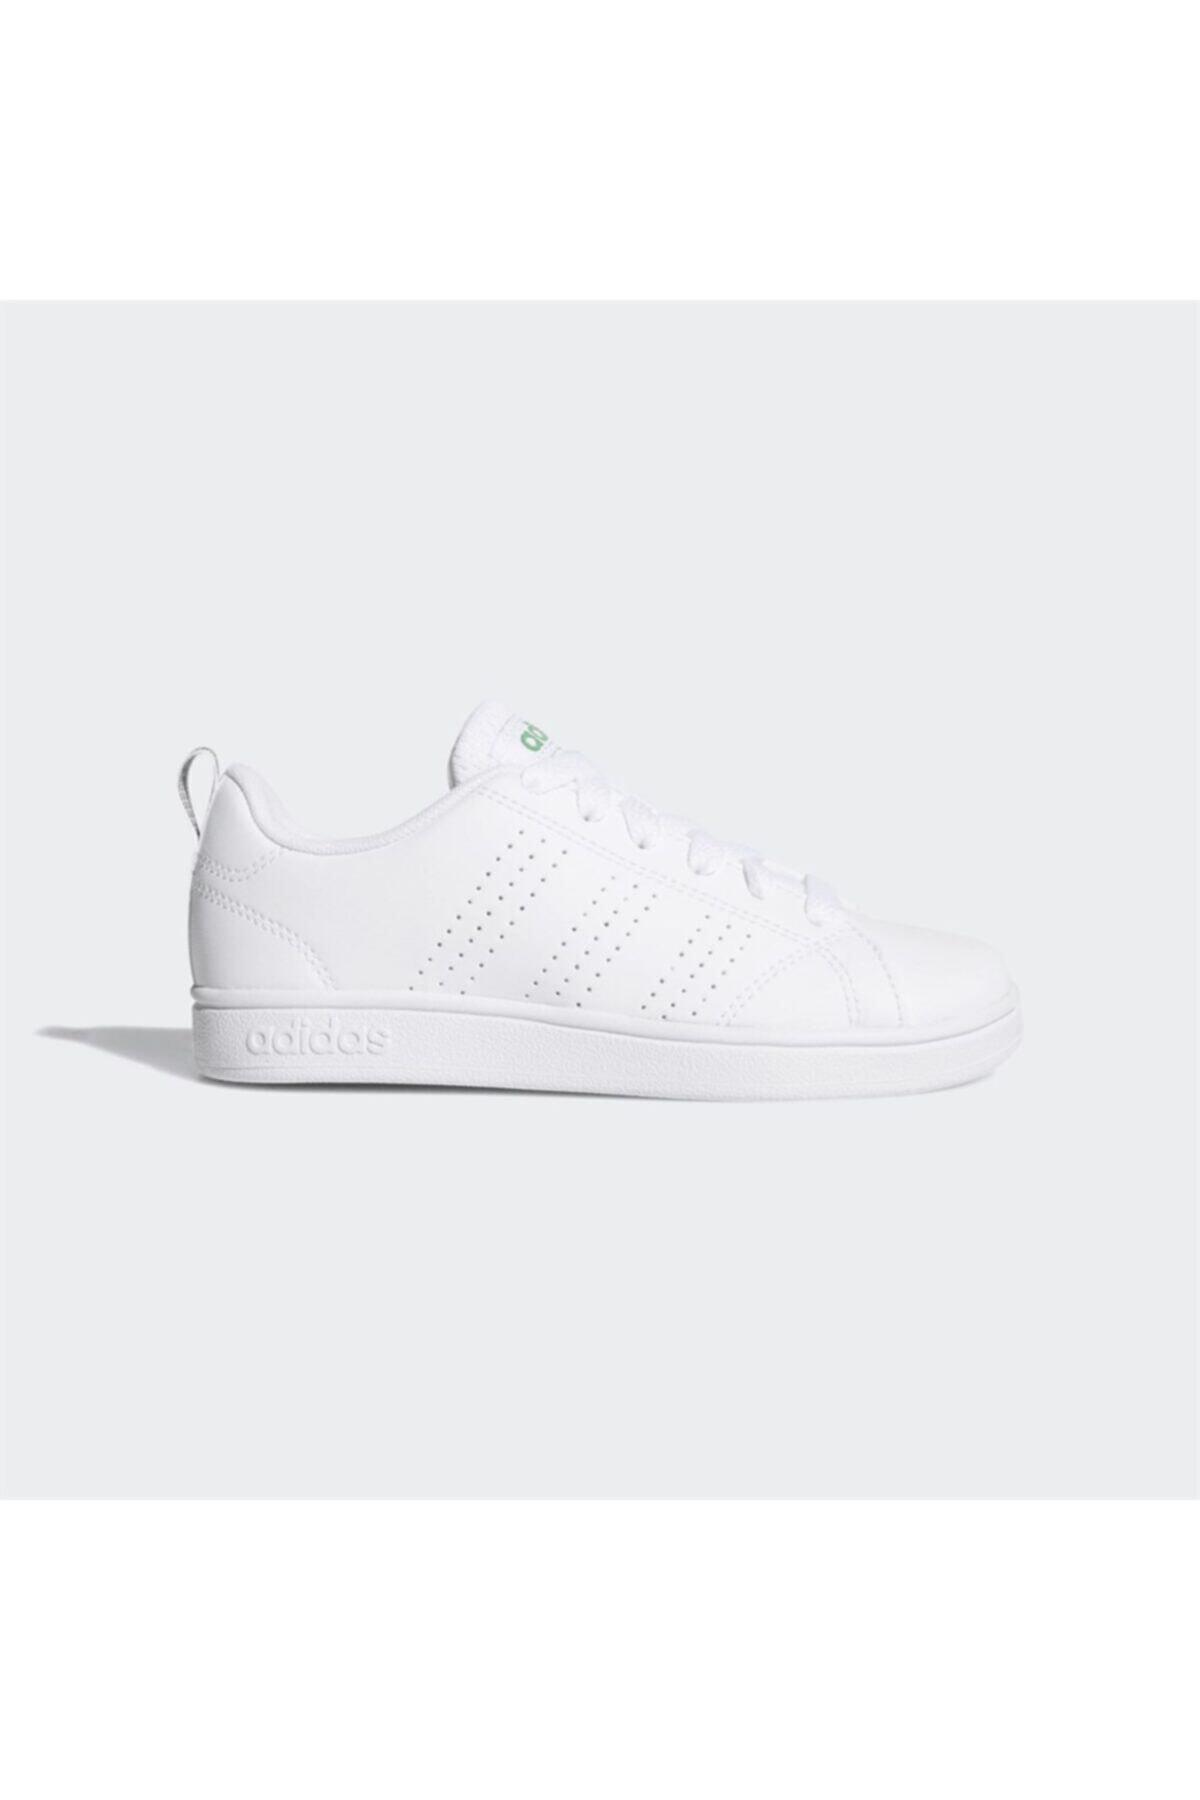 adidas ADVANTAGE CLEAN Beyaz Haki Erkek Çocuk Sneaker 100280003 1